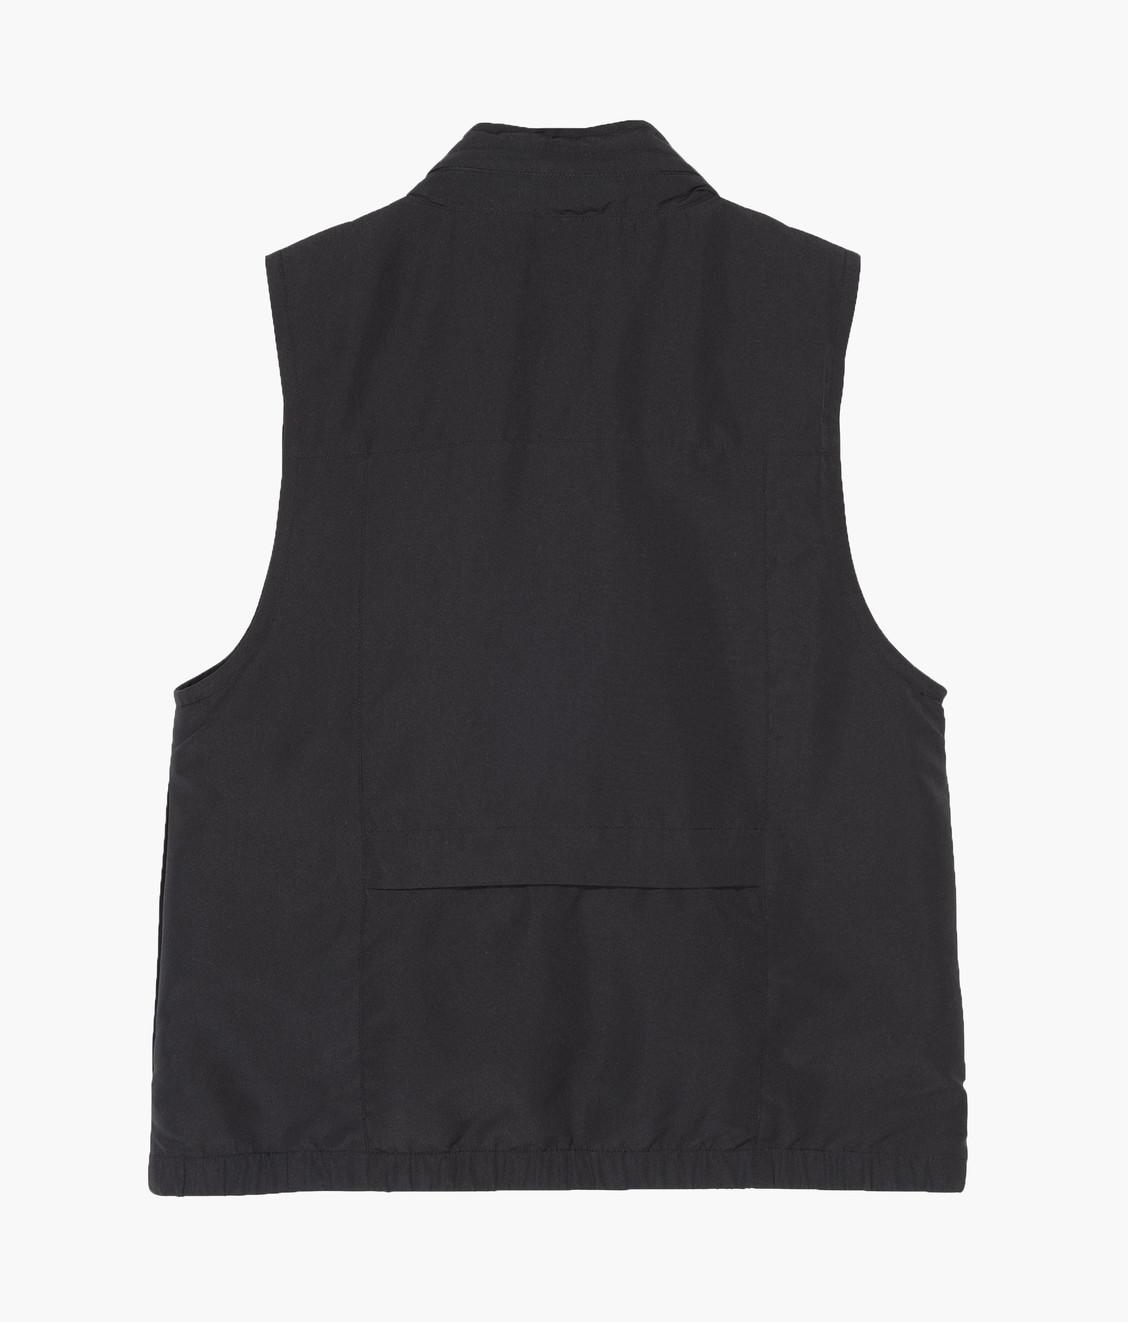 Stussy Stussy Multi Function Vest Black